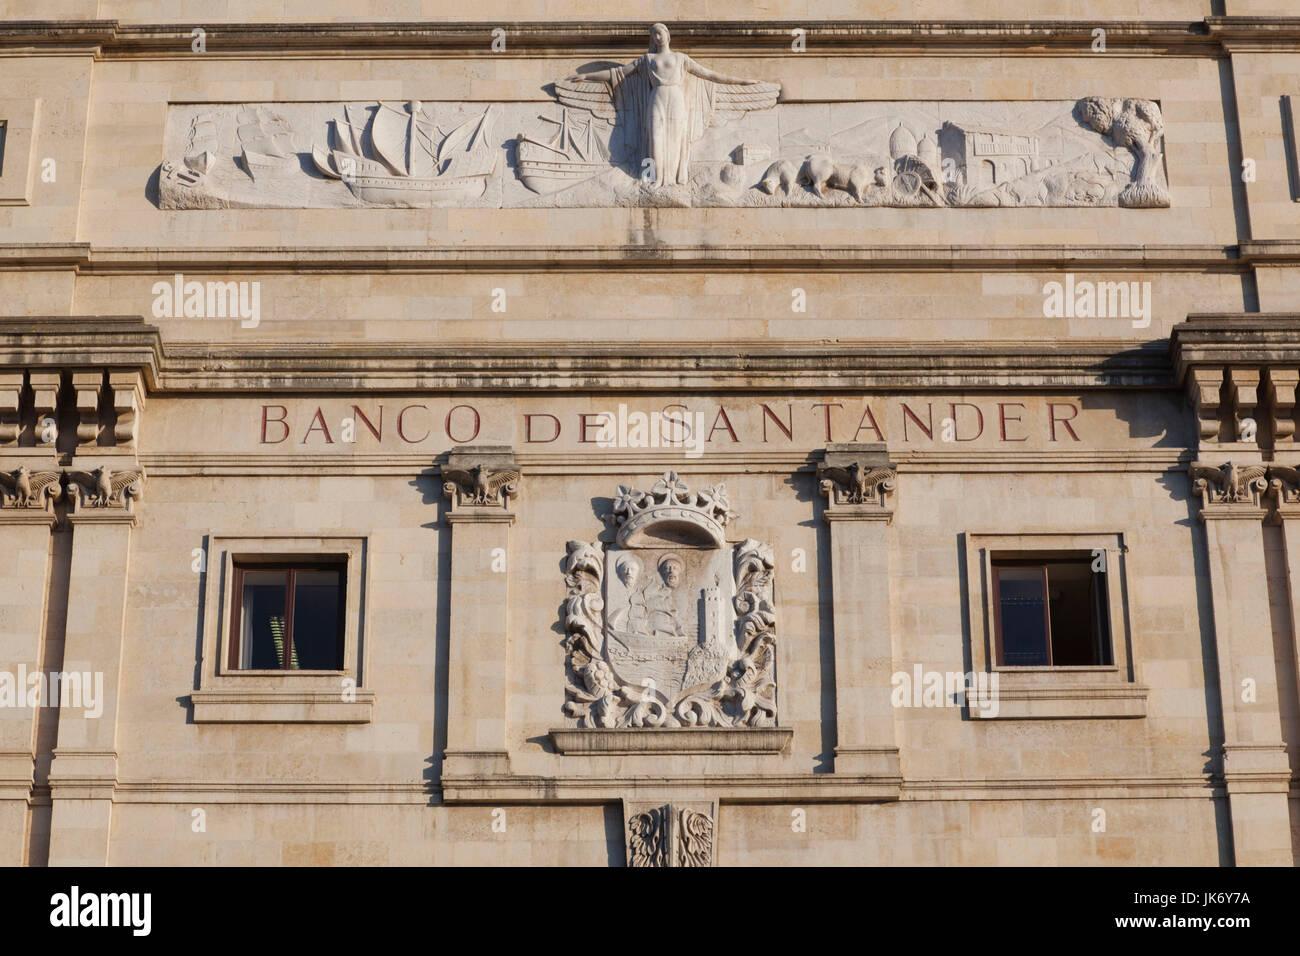 Spain, Cantabria Region, Cantabria Province, Santander, detail of the original Banco de Santander building, largest Stock Photo